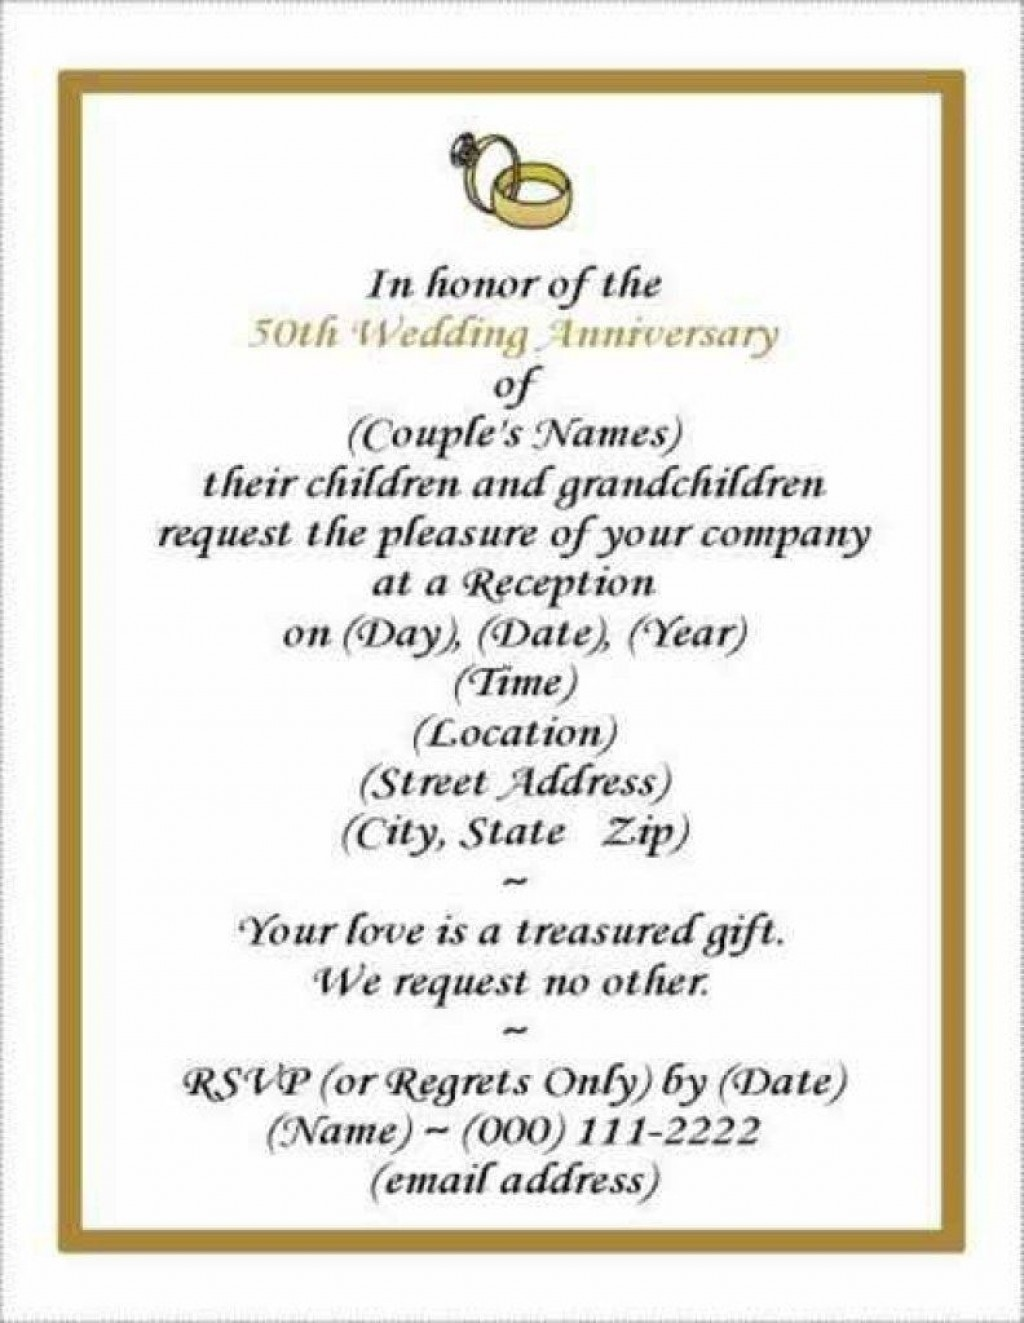 006 Sensational 50th Wedding Anniversary Invitation Template Free Image  Download Golden Microsoft WordLarge